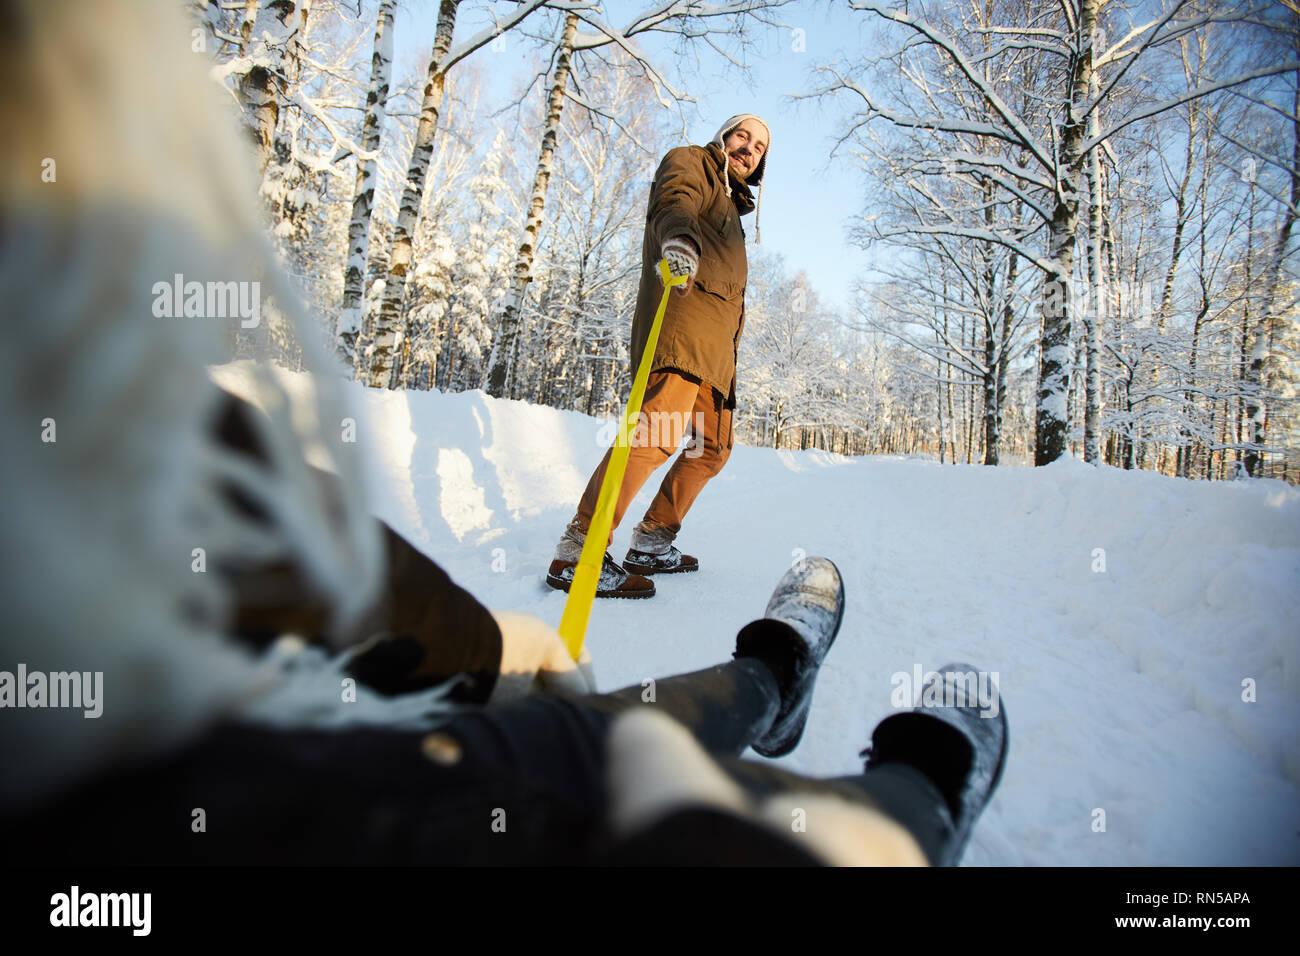 Mature Man Tugging Sleigh - Stock Image